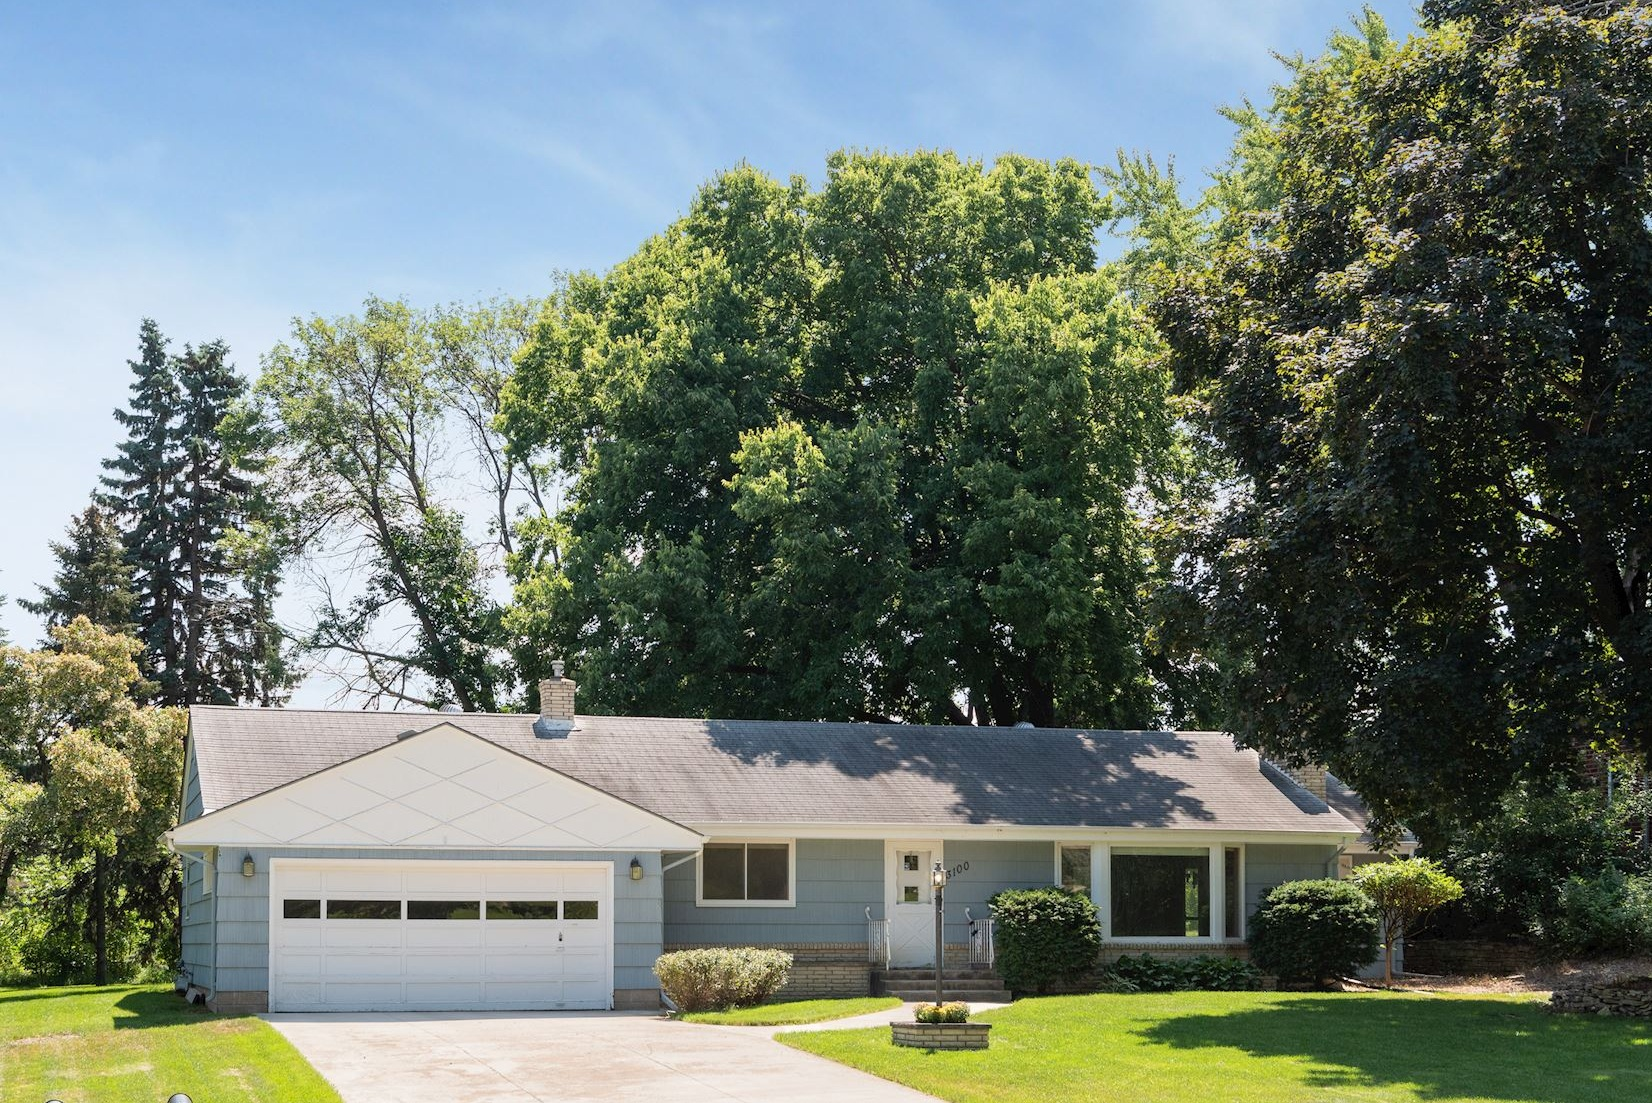 3100 Ridgewood Road Roseville, MN 55112 -